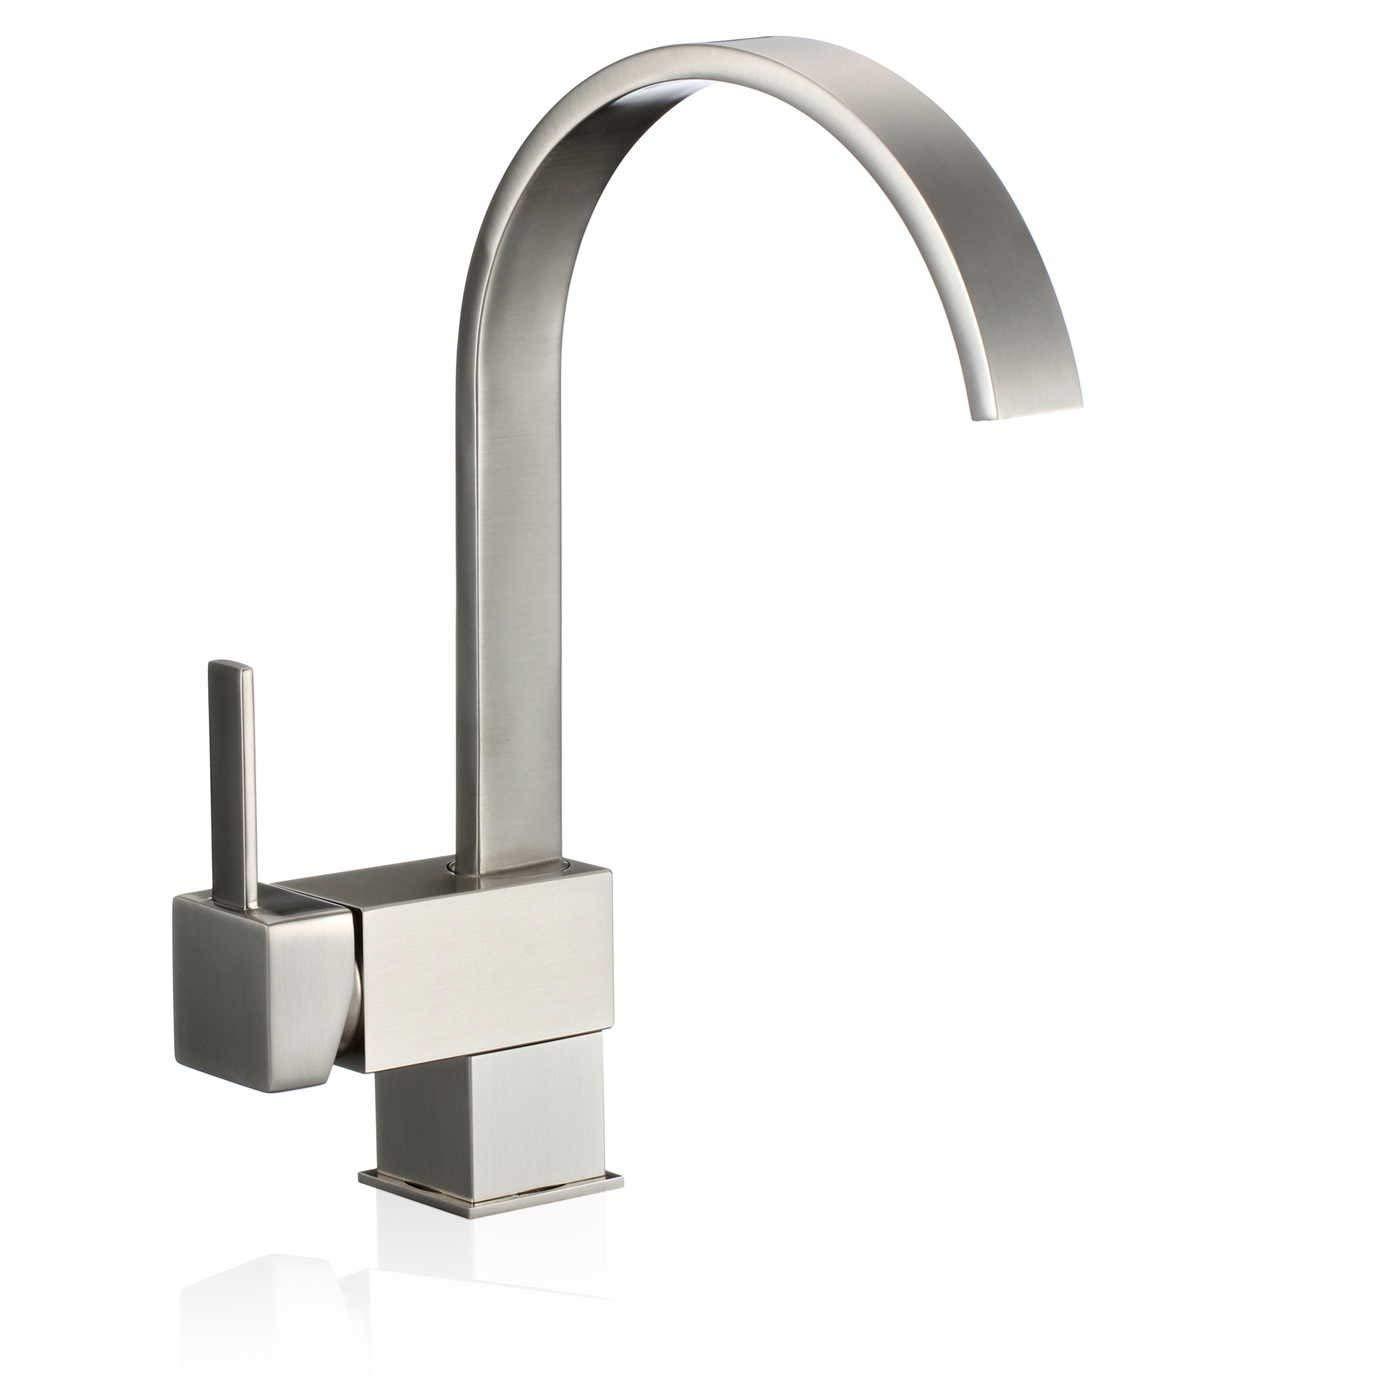 Avery Modern Kitchen Sink Faucet